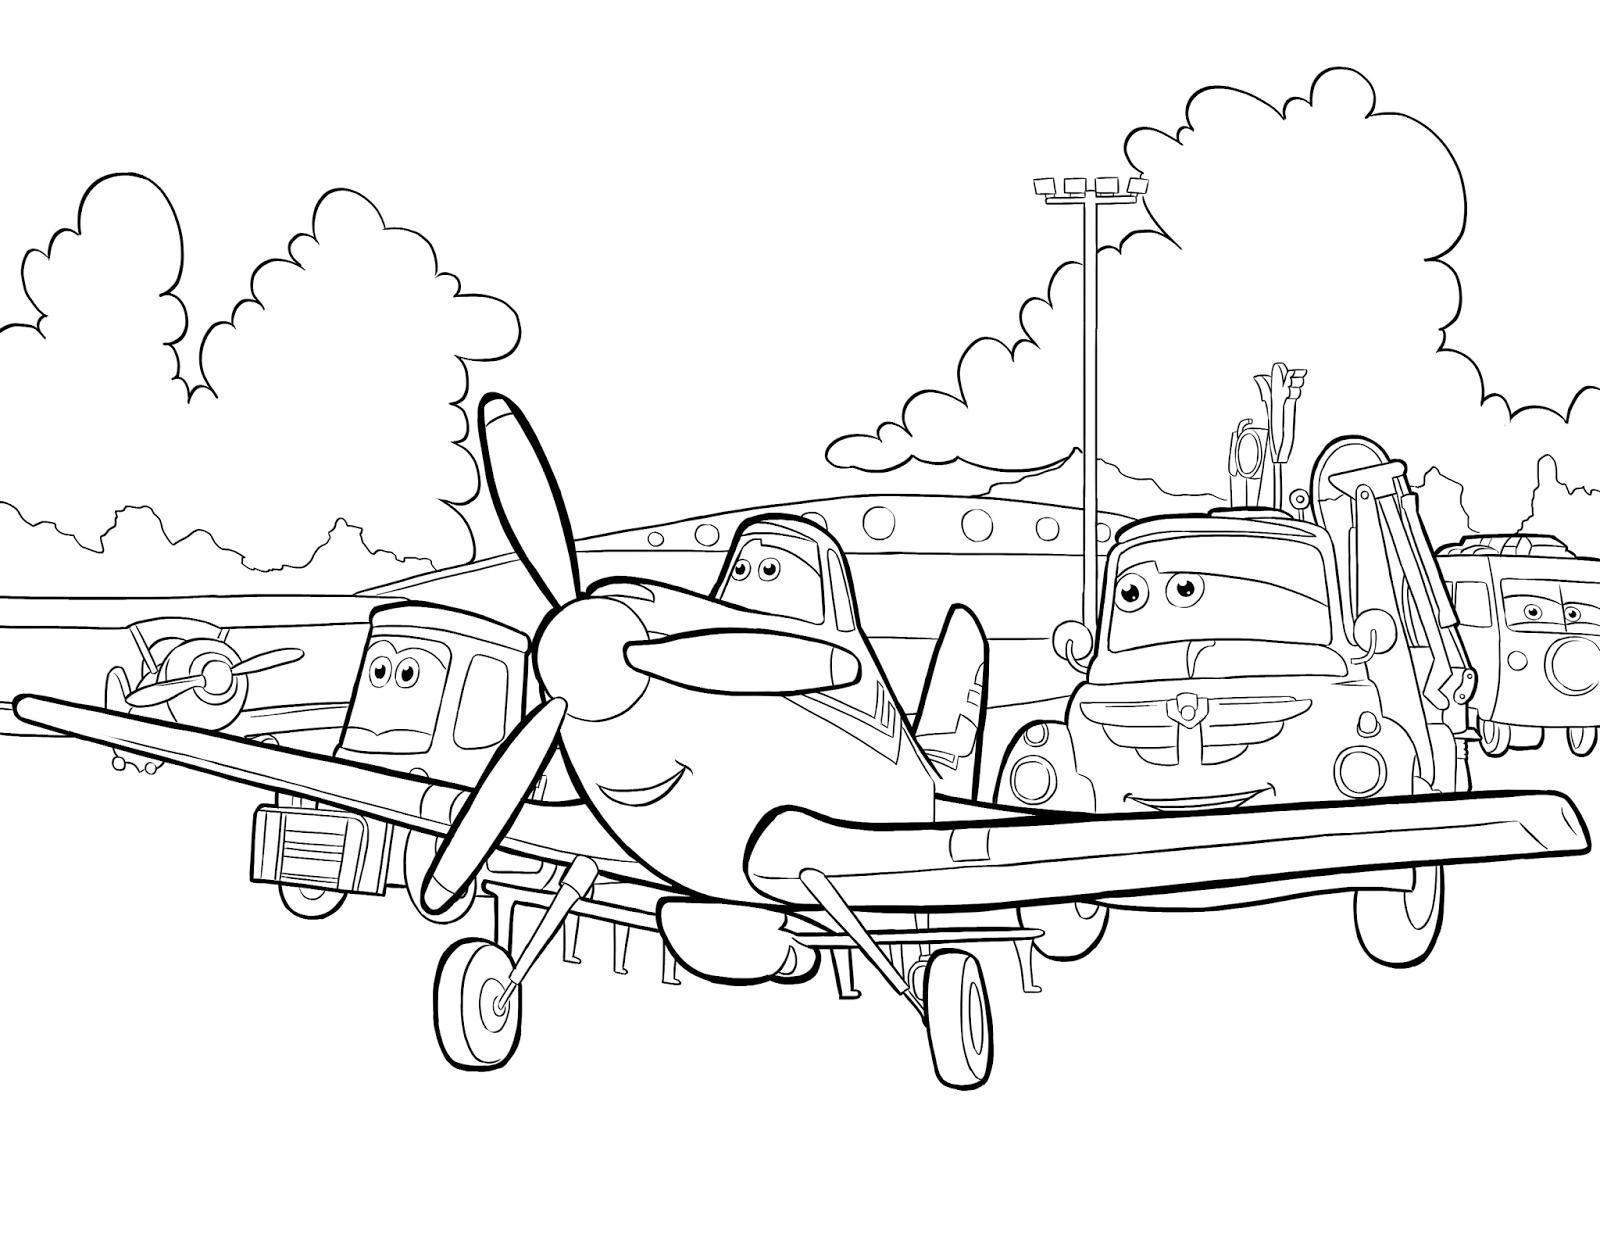 Kolorowanki Z Bajki Samoloty Do Wydruku Pokoloruj Swiat Free Coloring Pages Cartoon Coloring Pages Coloring Pages